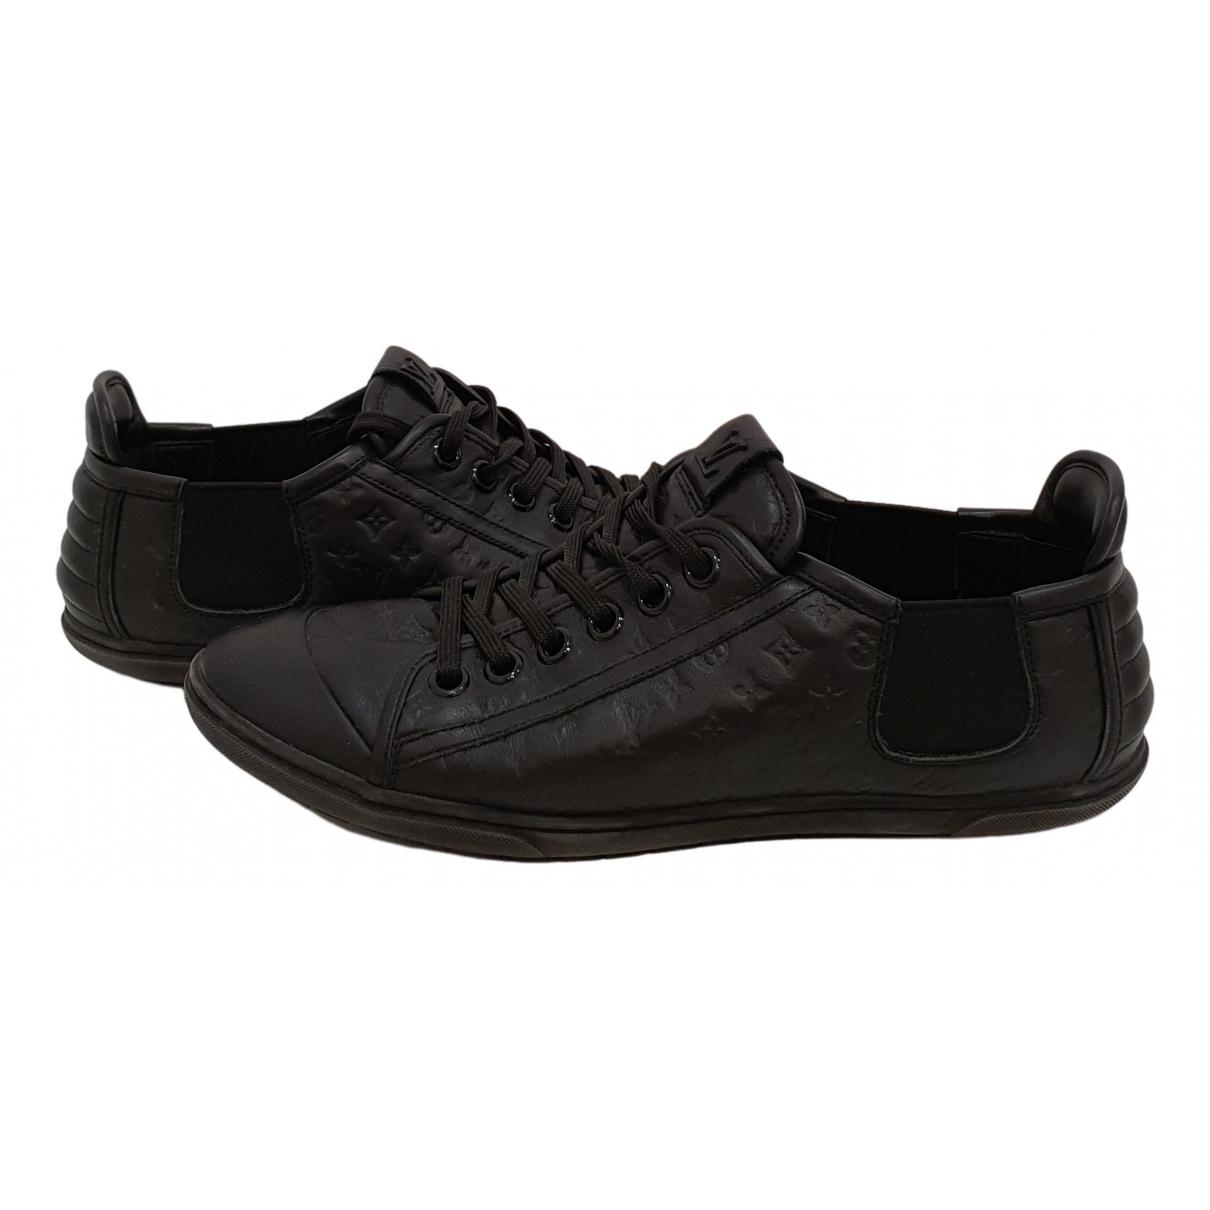 Louis Vuitton Match Up Sneakers in  Schwarz Leder